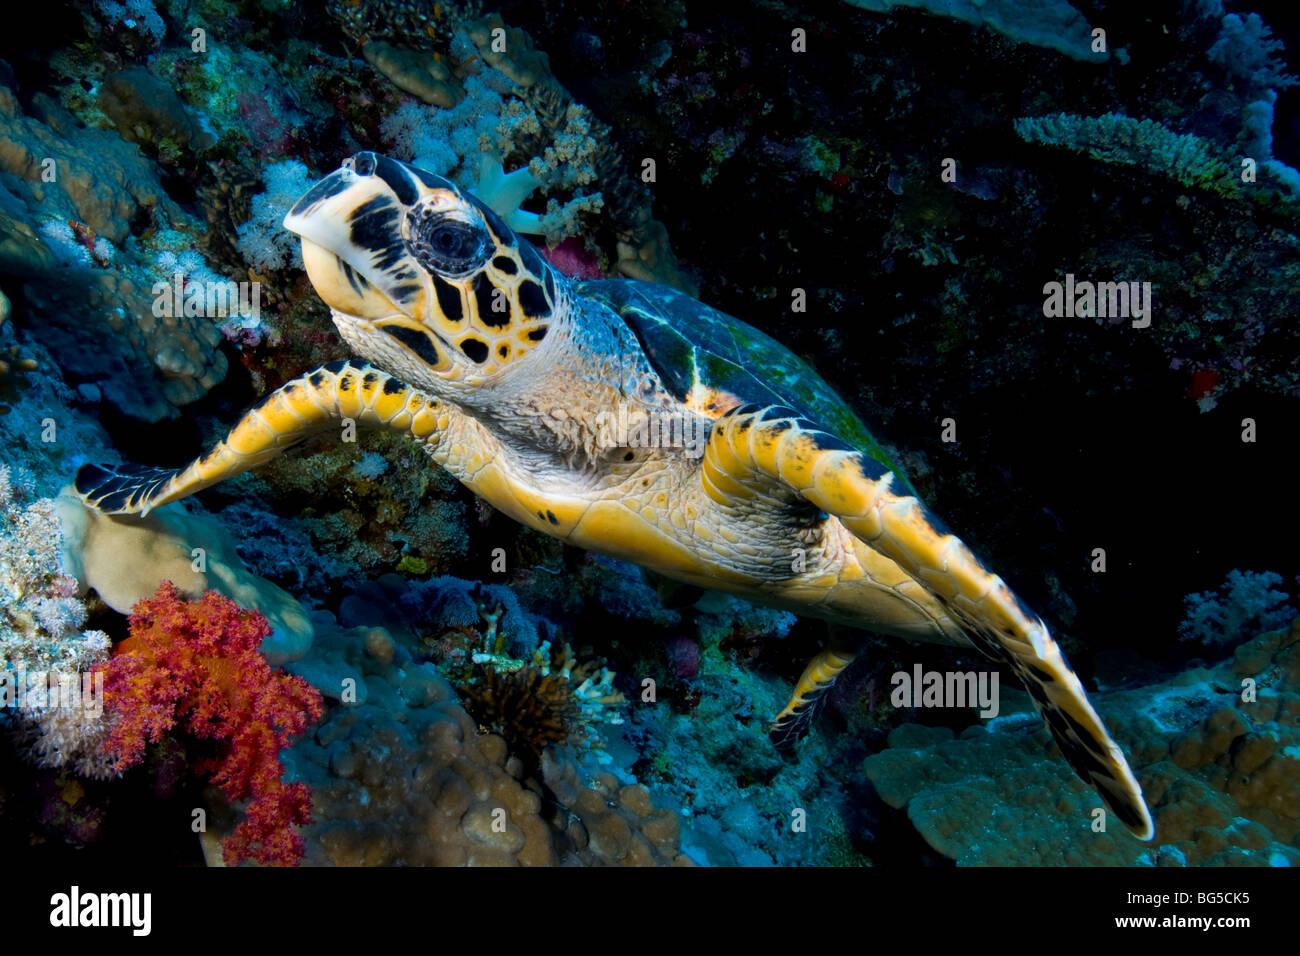 Red Sea coral reefs, Ras Mohammed, national park, turtle, ocean, scuba, underwater, ocean, sea, scuba, diving, hard - Stock Image